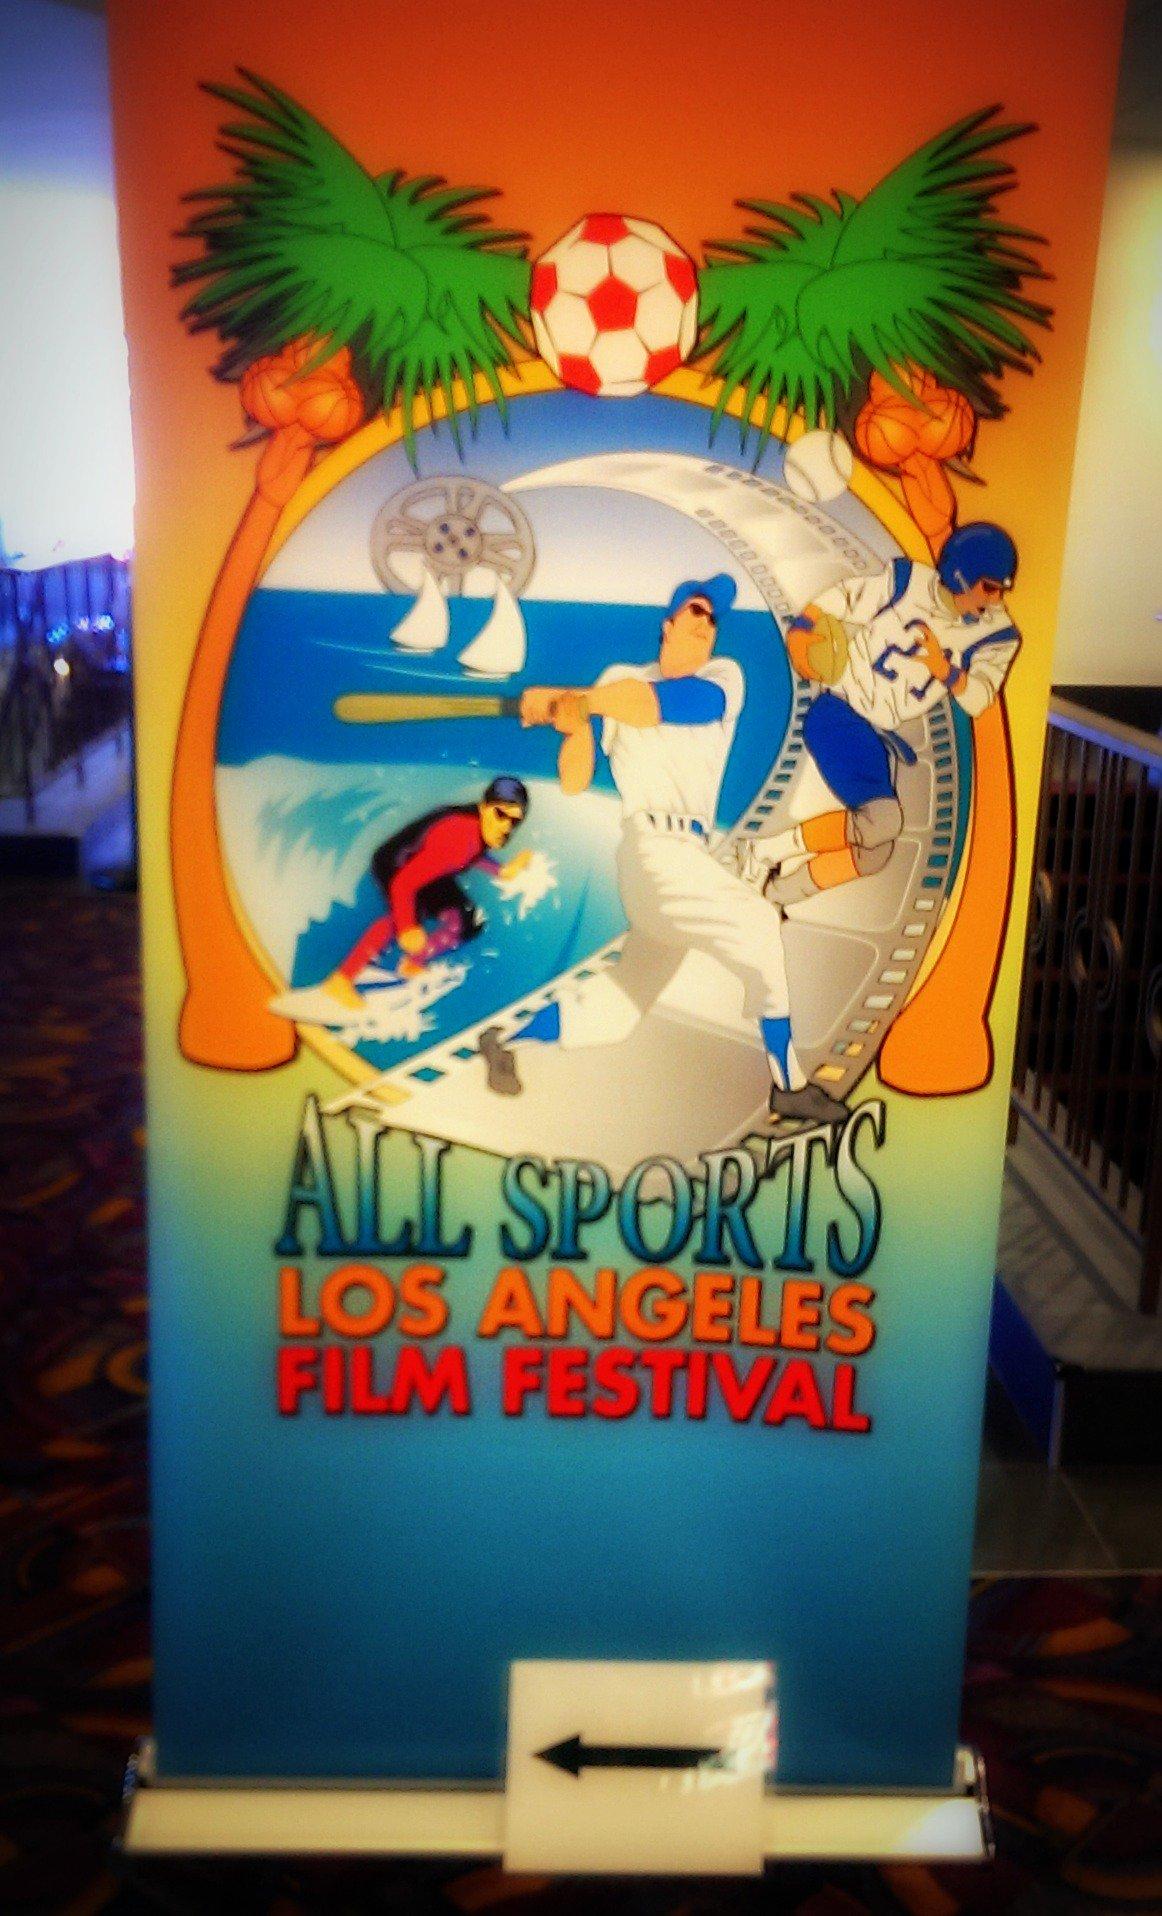 All Sports Film Festival